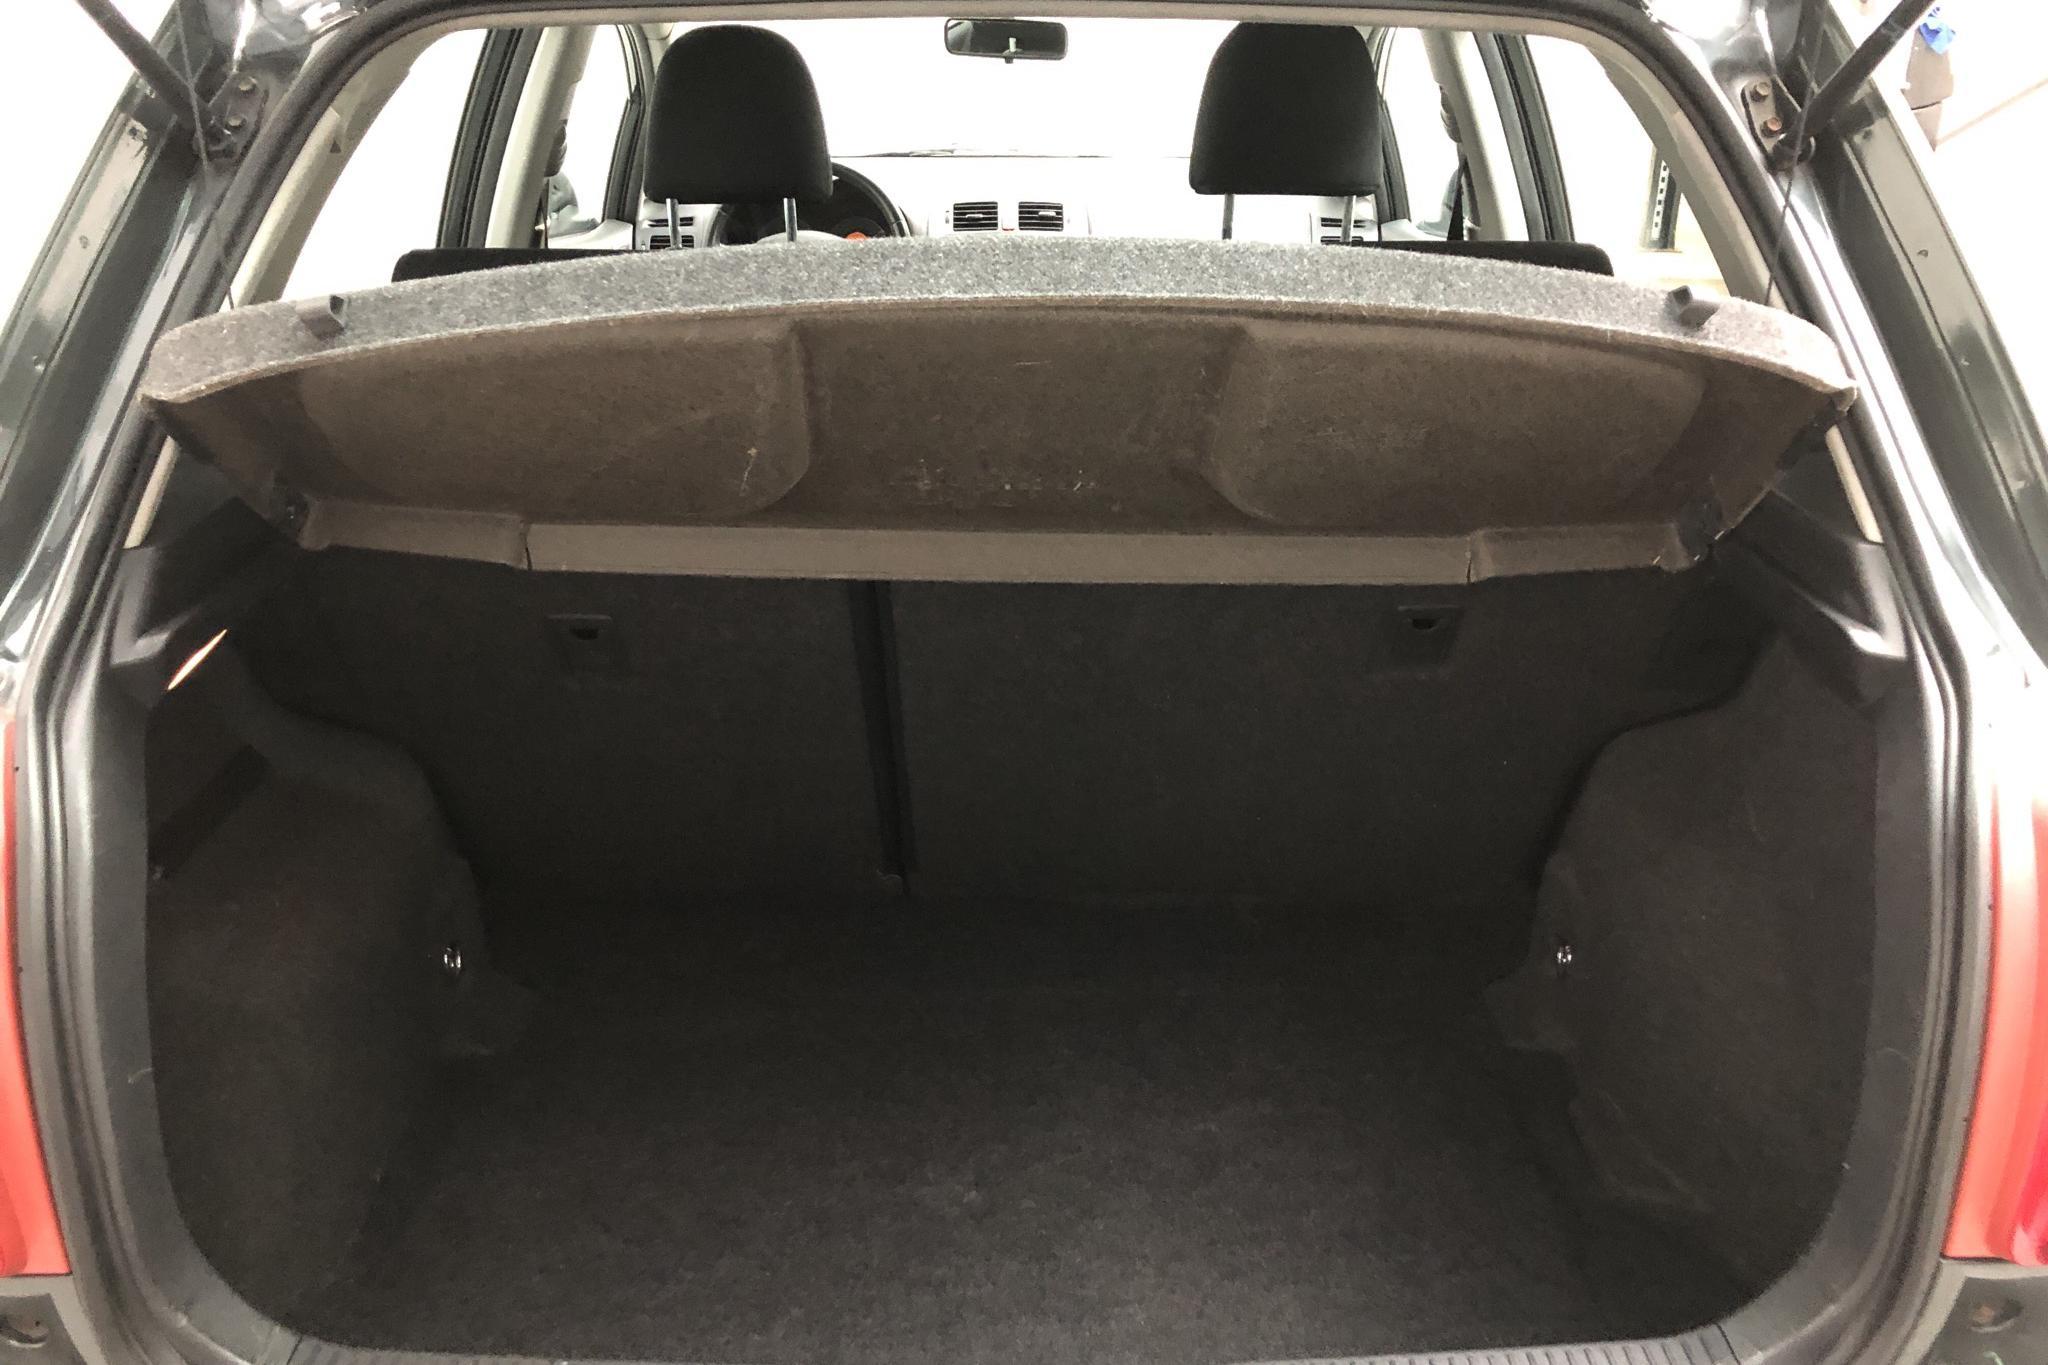 Toyota Auris 1.6 VVT-i 5dr (124hk) - 156 010 km - Manual - Dark Green - 2008